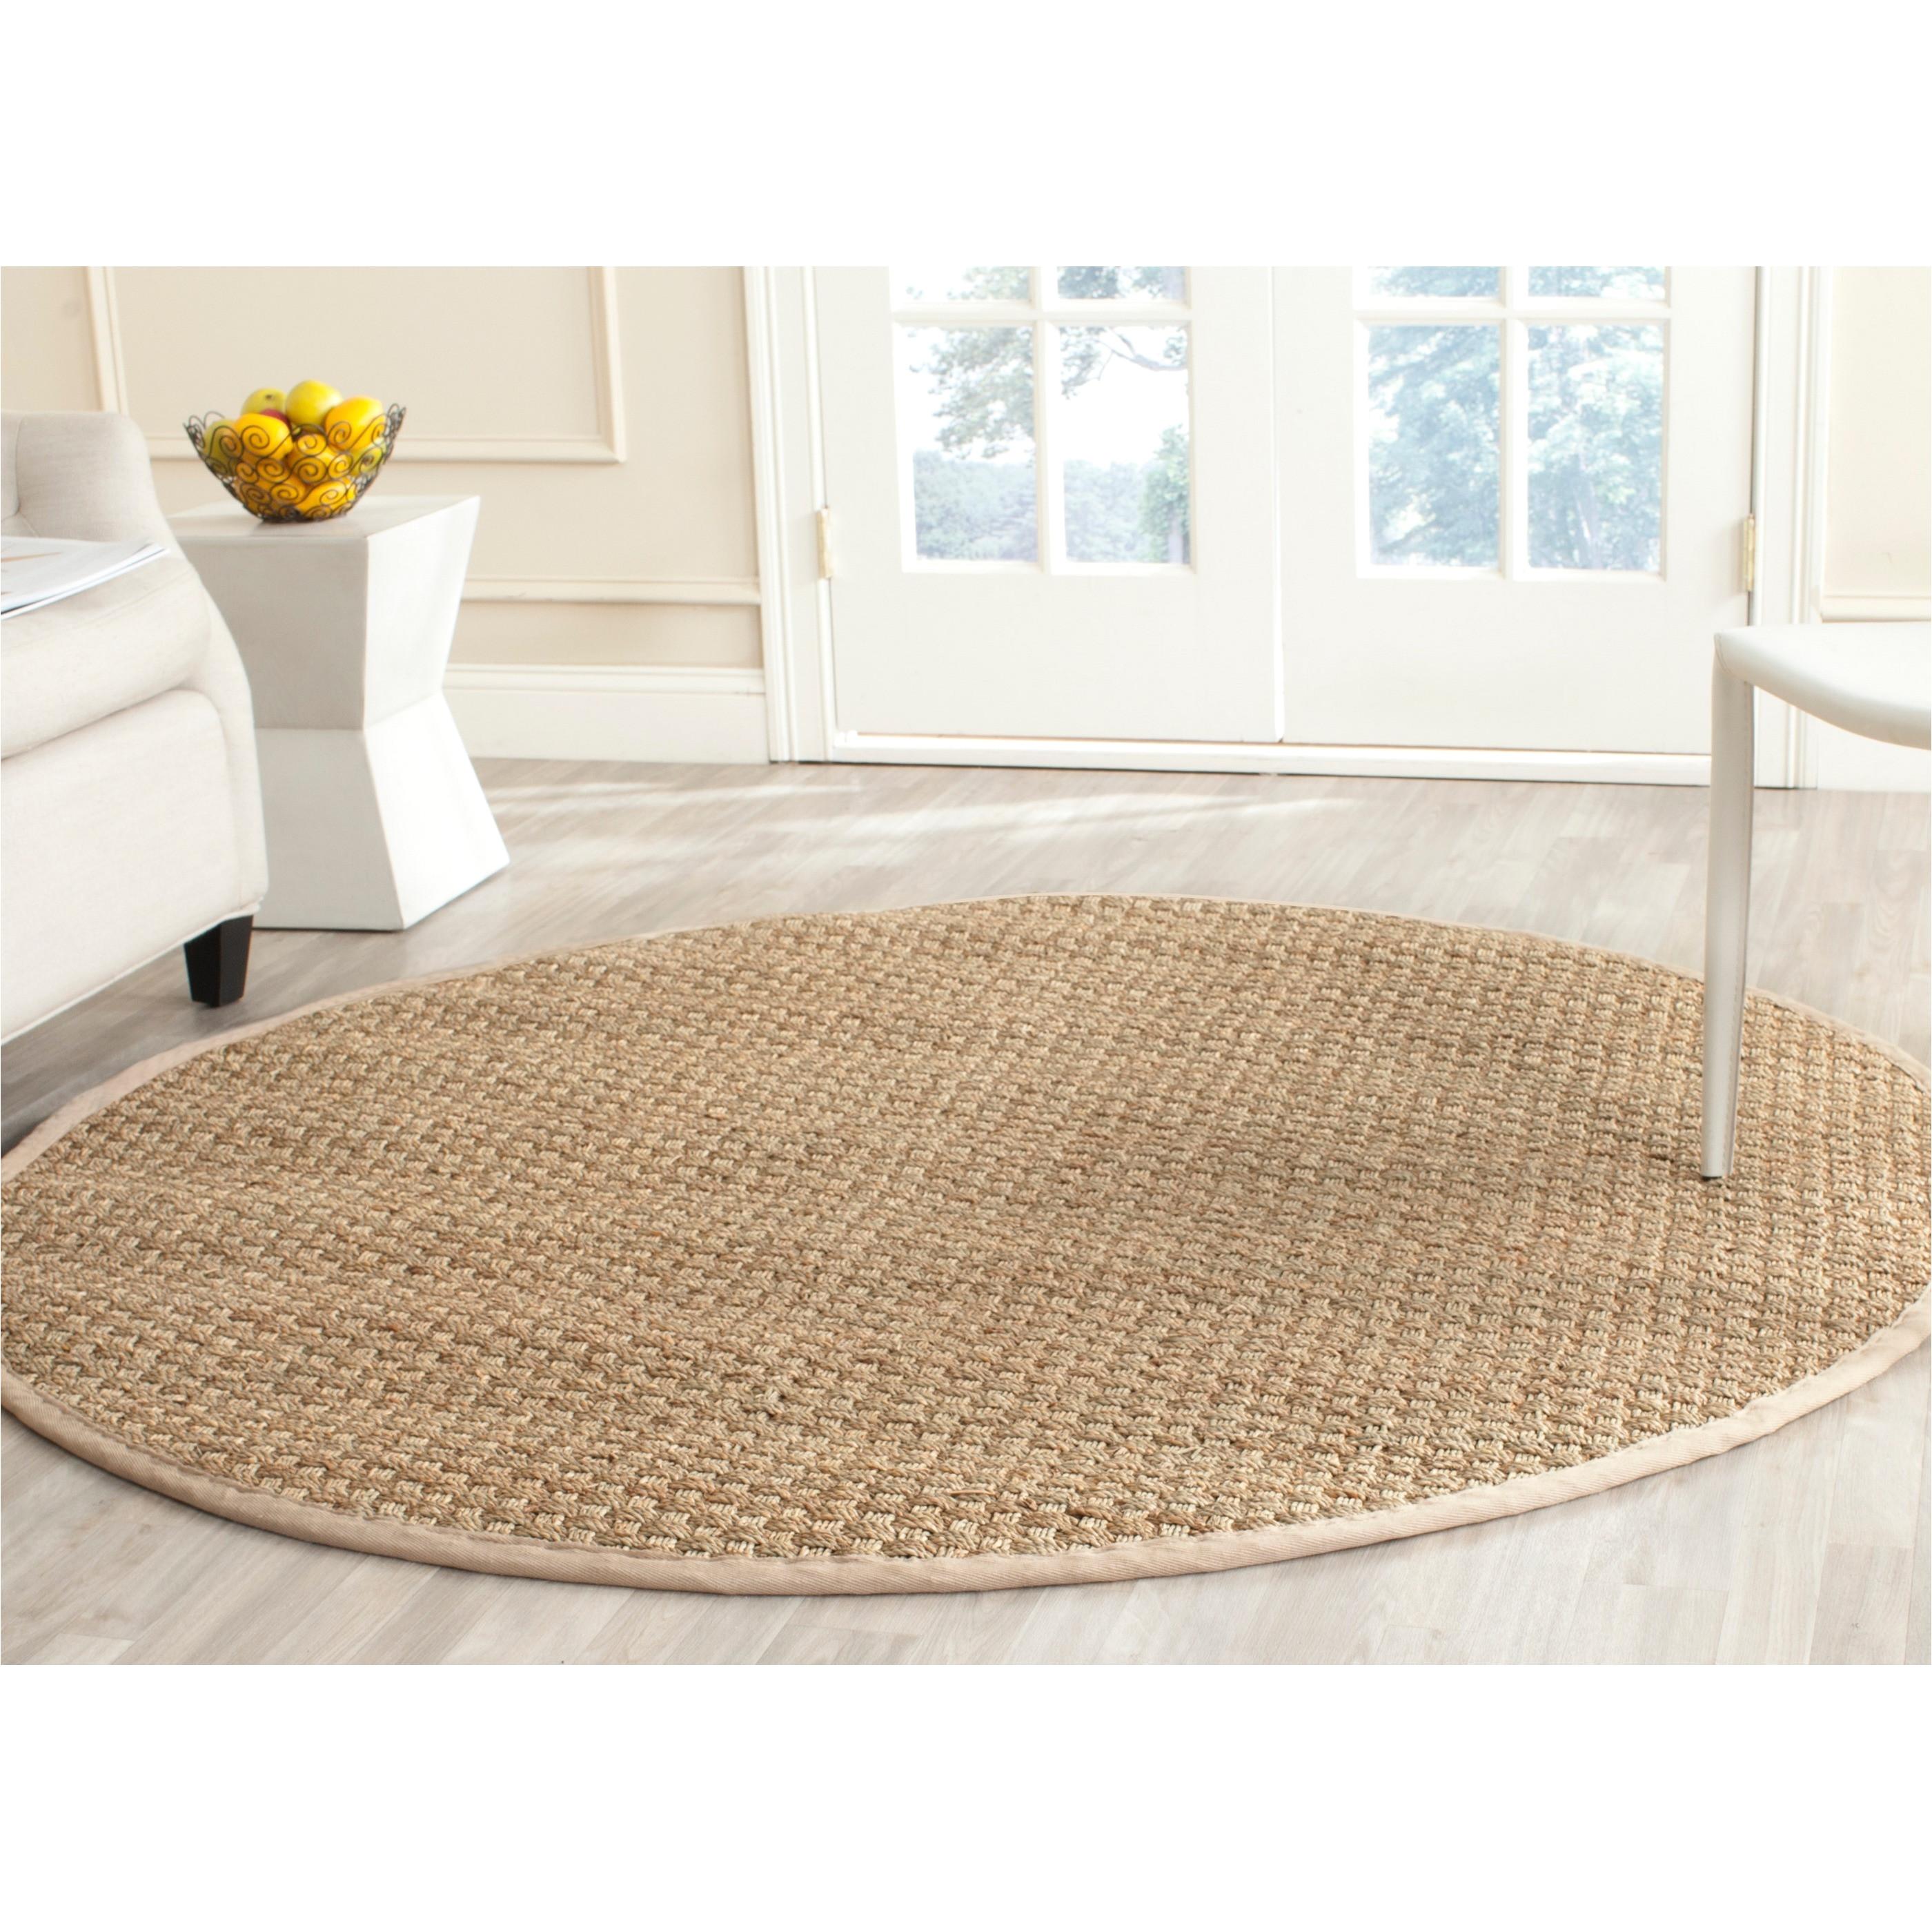 rug turquoise area ikea rugs usa round cream large cowhide gaser pottery barn sisal rectangle anti